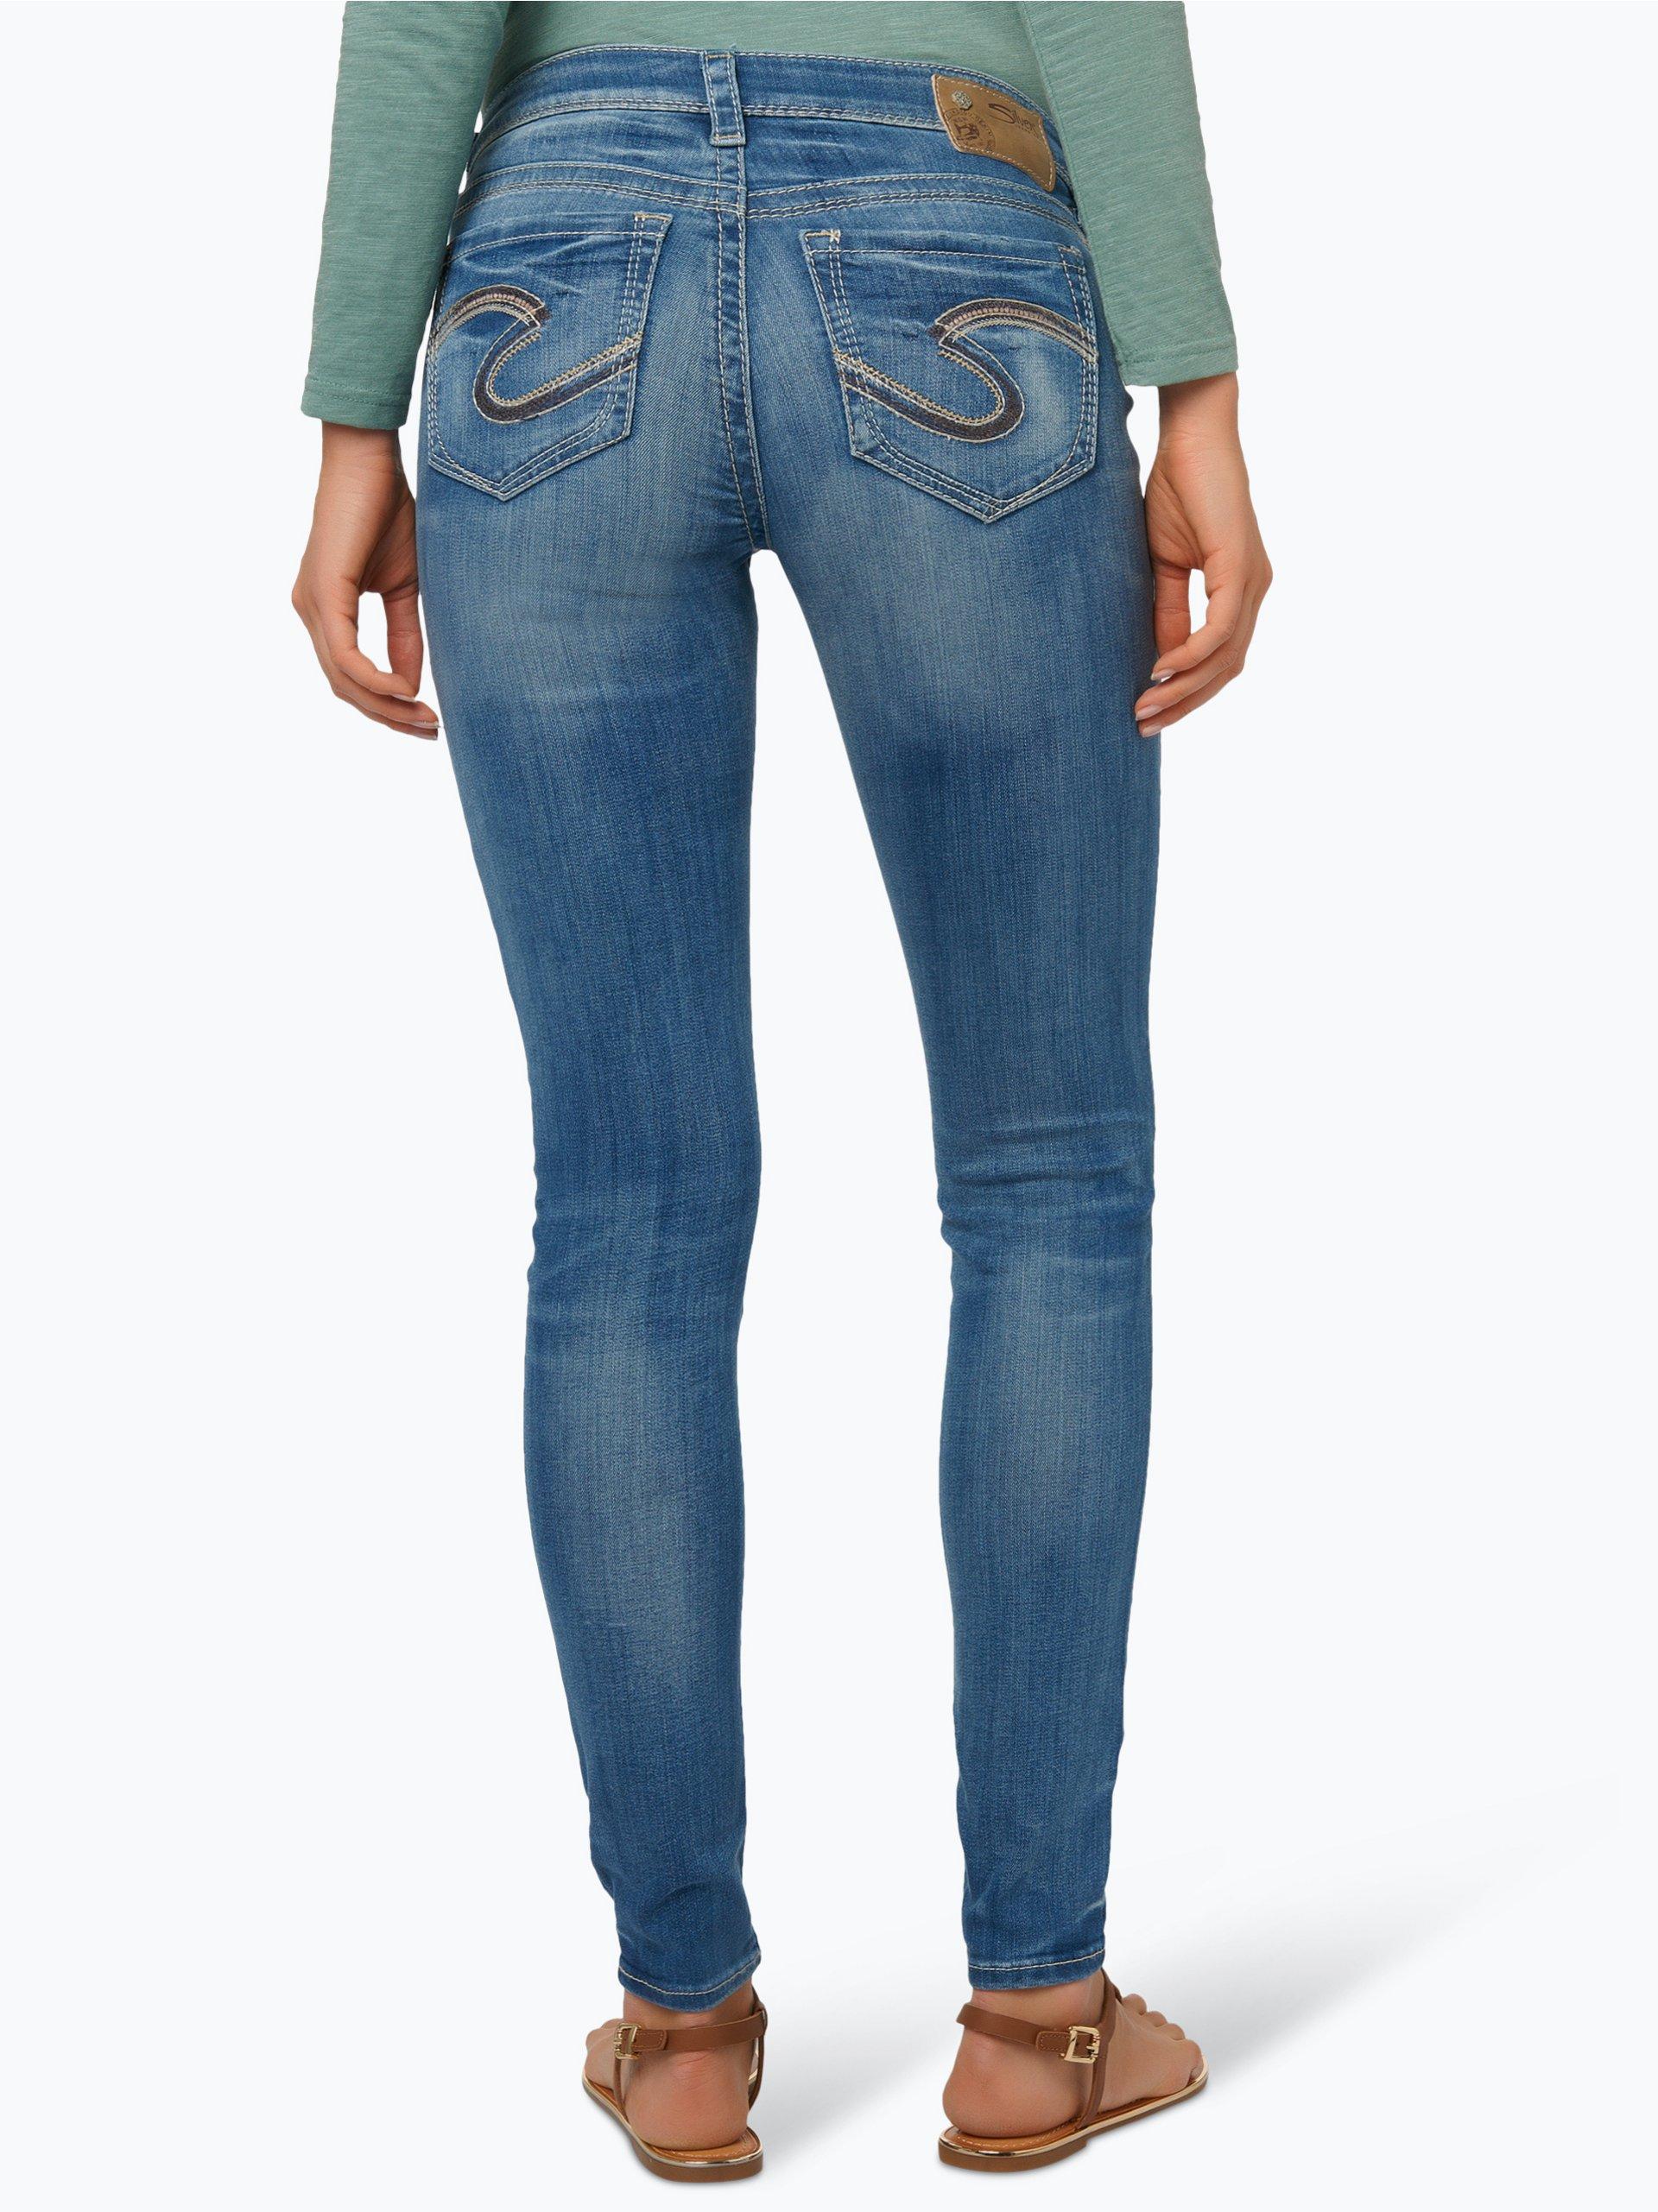 silver jeans damen jeans suki light stone uni online kaufen peek und cloppenburg de. Black Bedroom Furniture Sets. Home Design Ideas